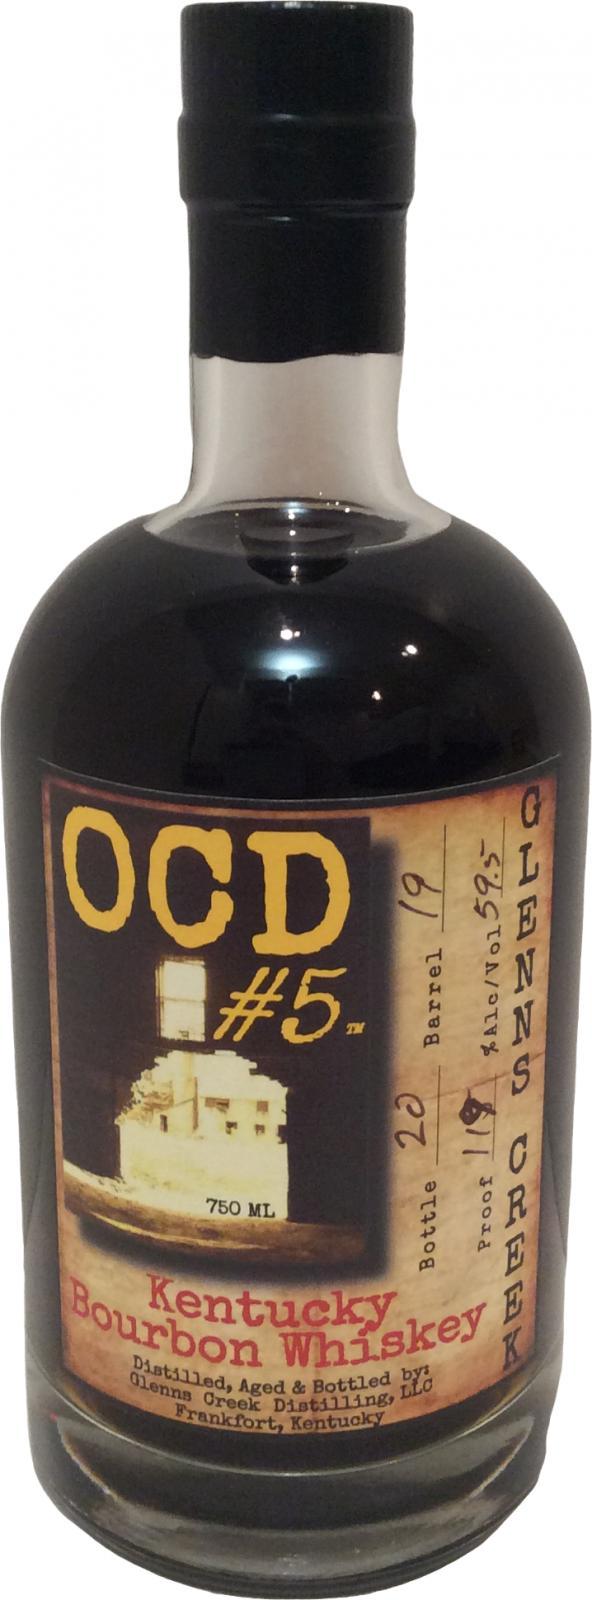 OCD #5 Kentucky Bourbon Whiskey